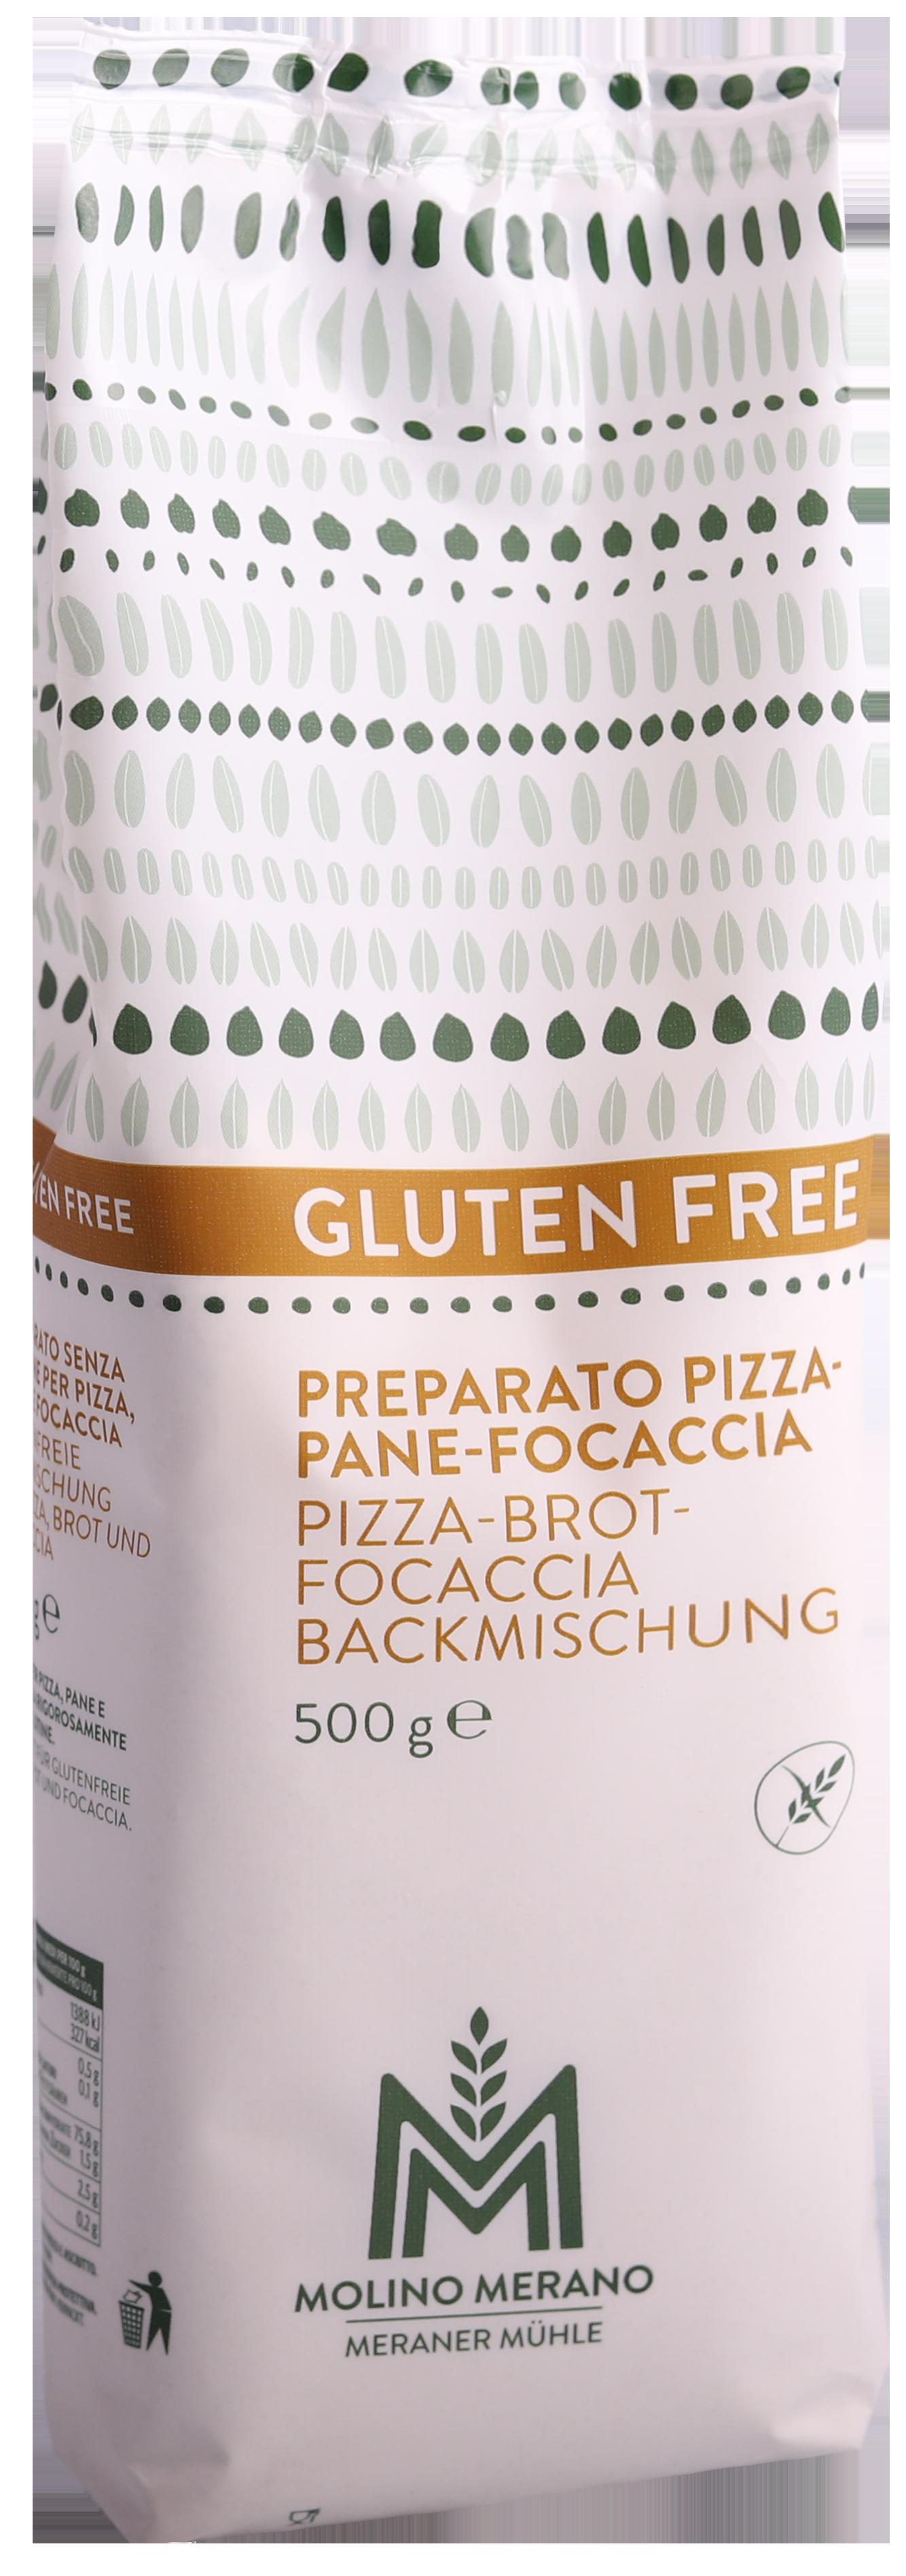 Pizza-Brot-Focaccia Backmischung glutenfrei